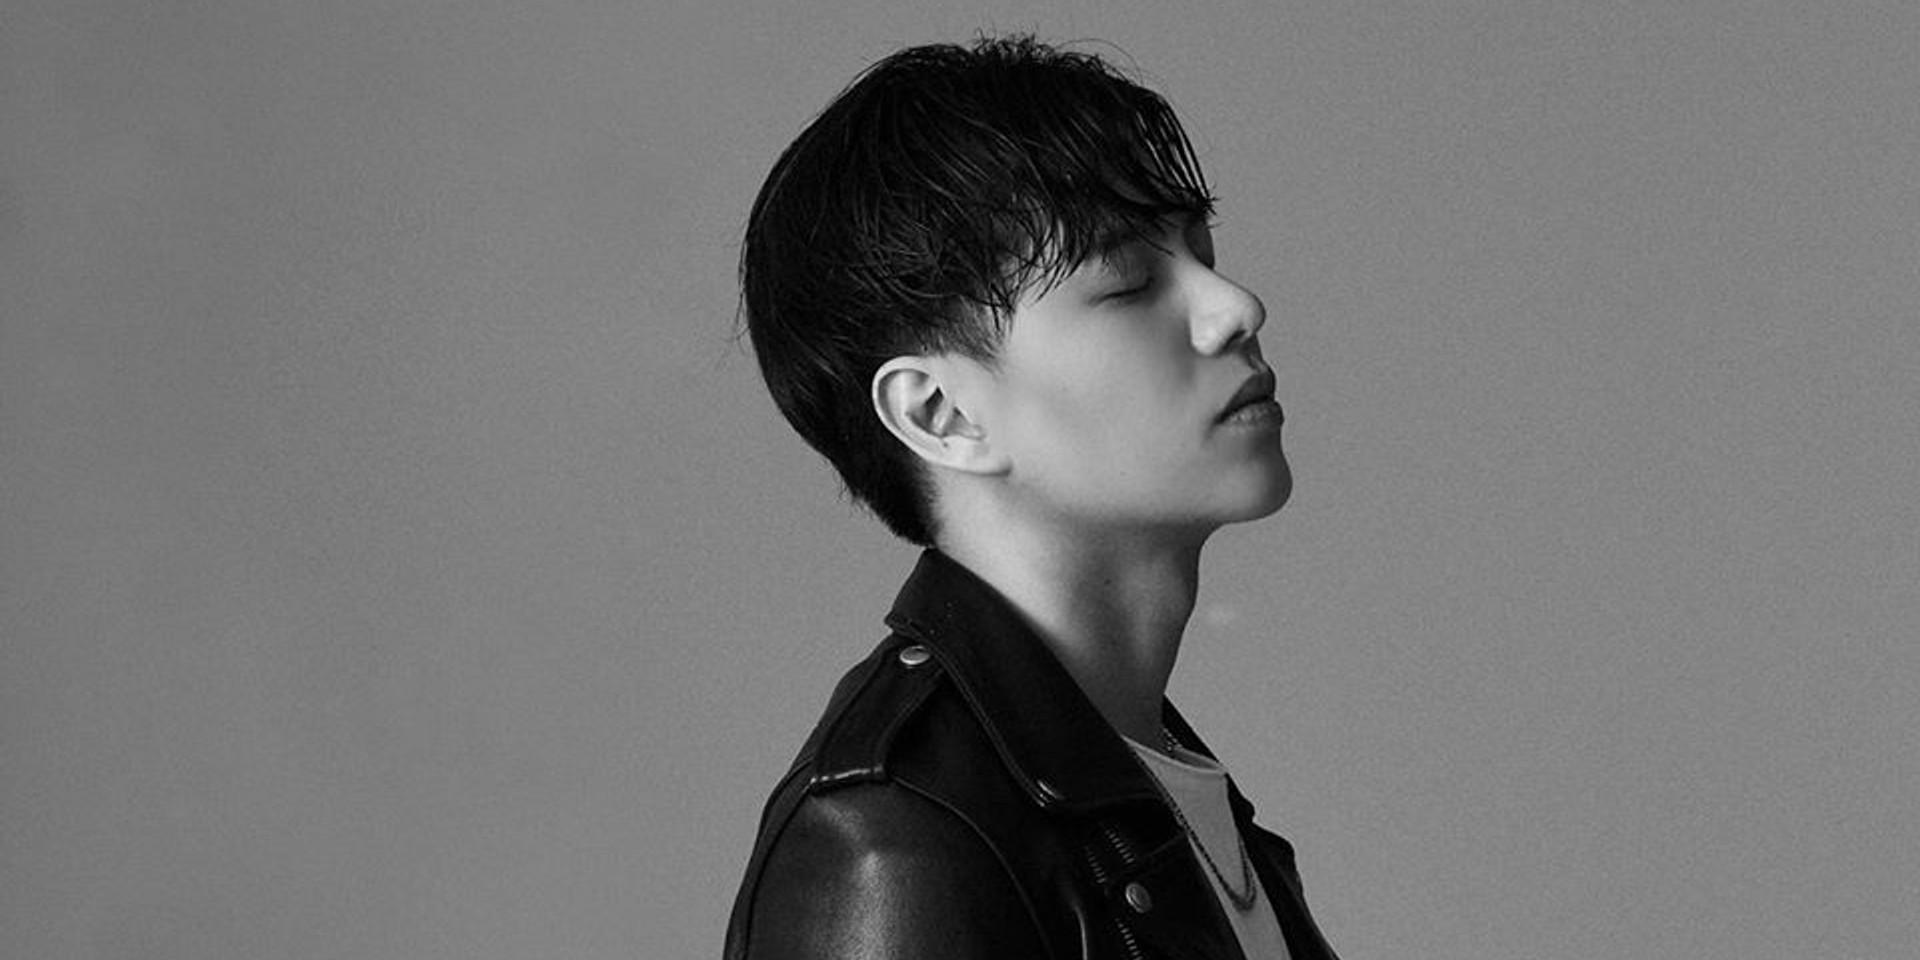 Gen Neo unveils new single 'OVER U'